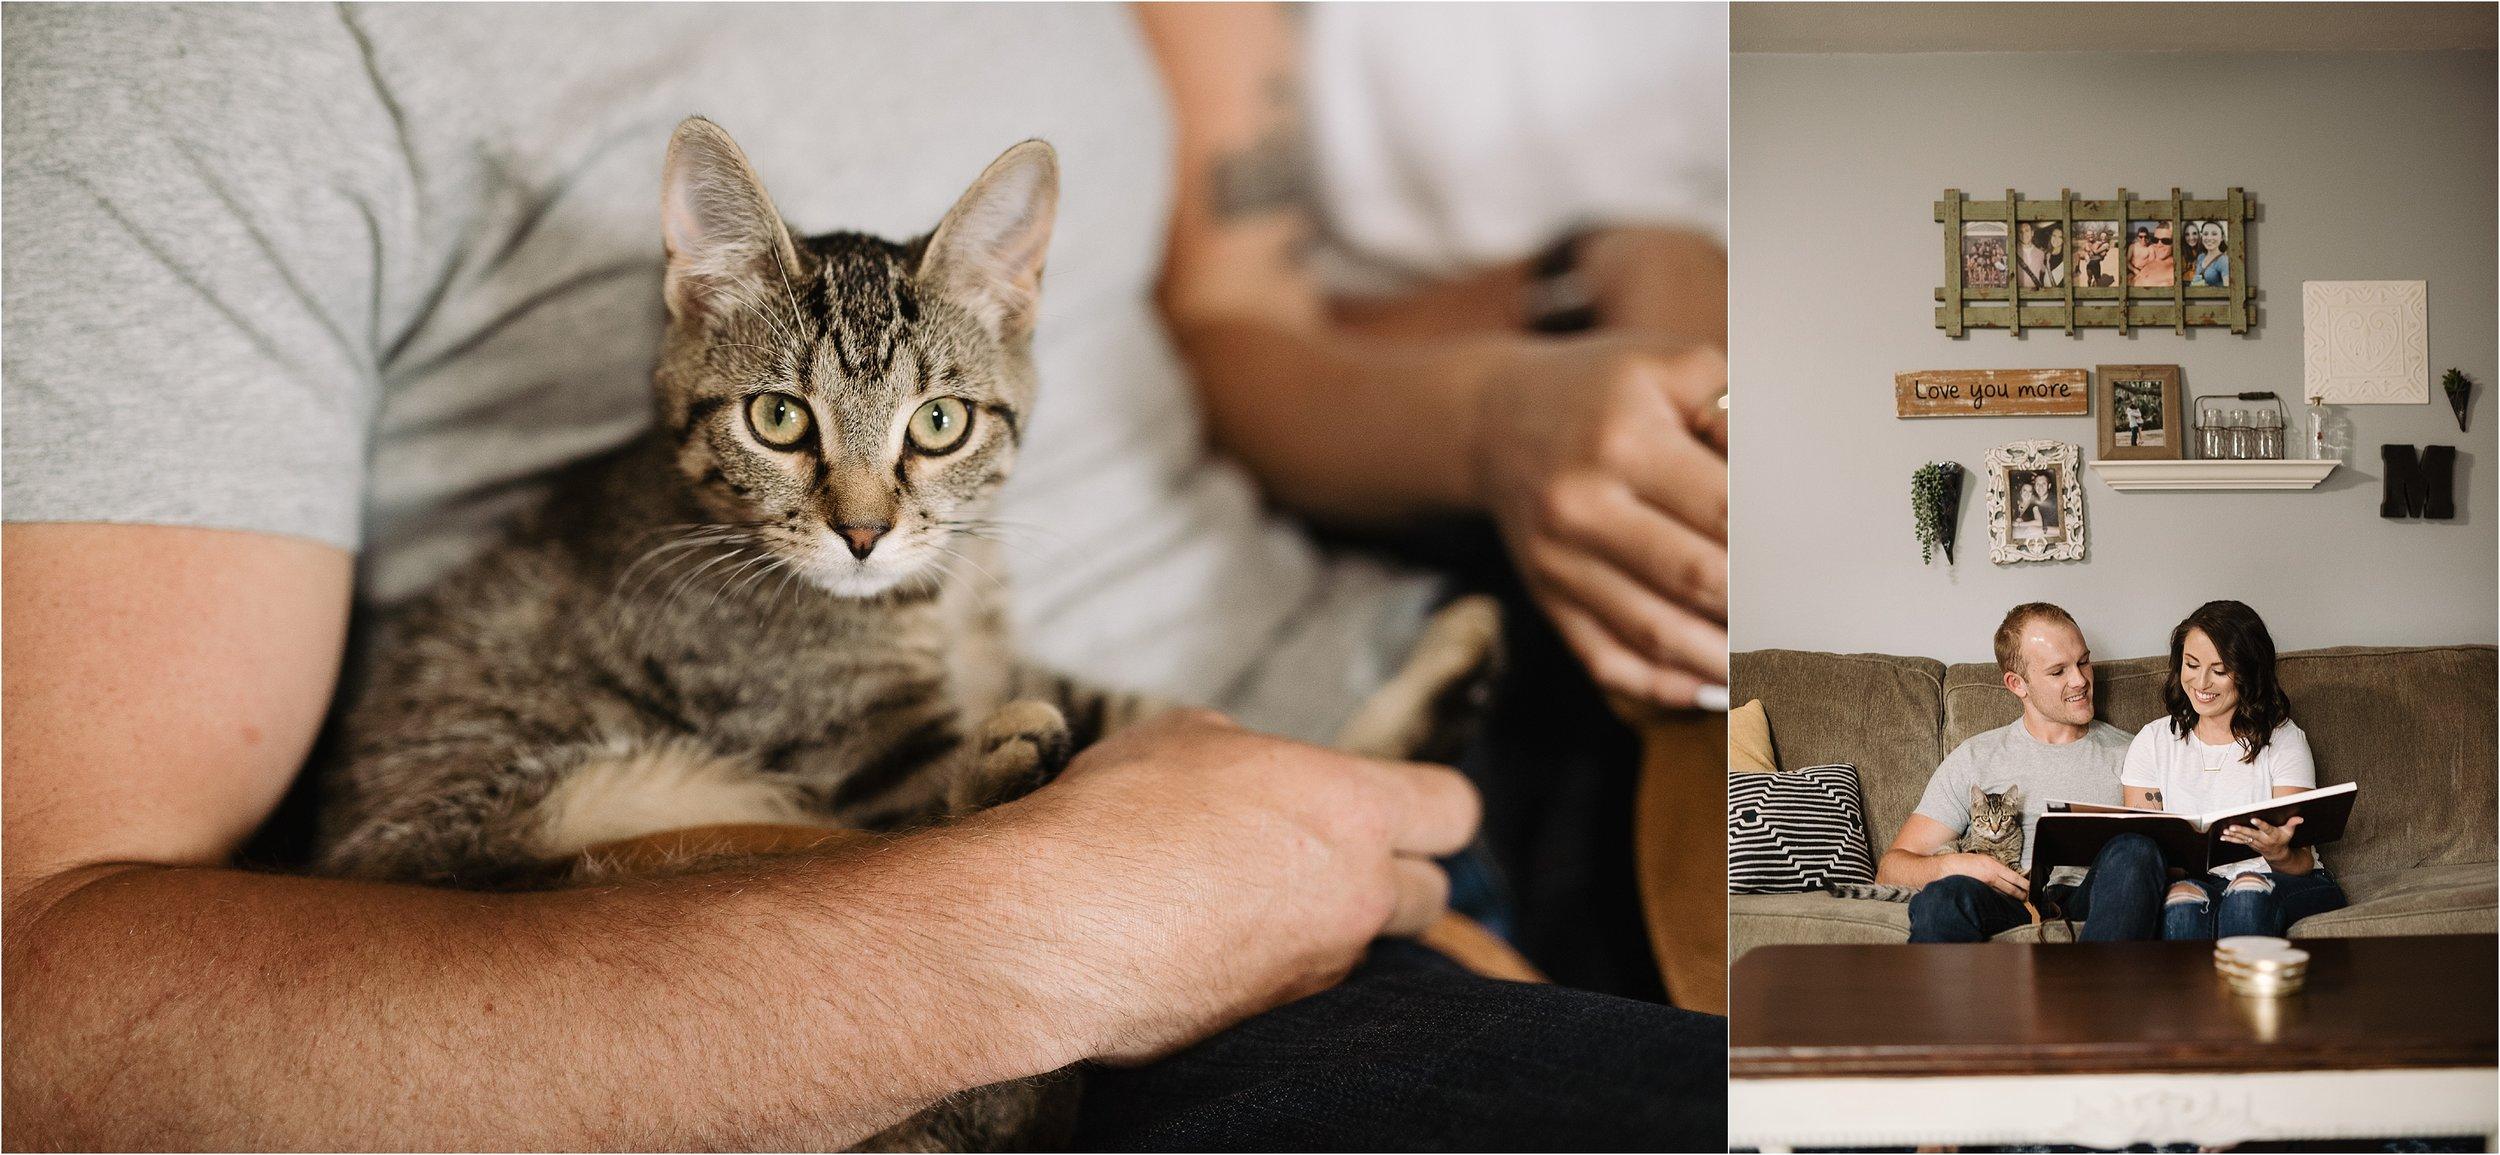 anniversary photos session oklahoma wedding photographer outdoors fall edmond okc wichita kansas norman wedding album at home in home cats